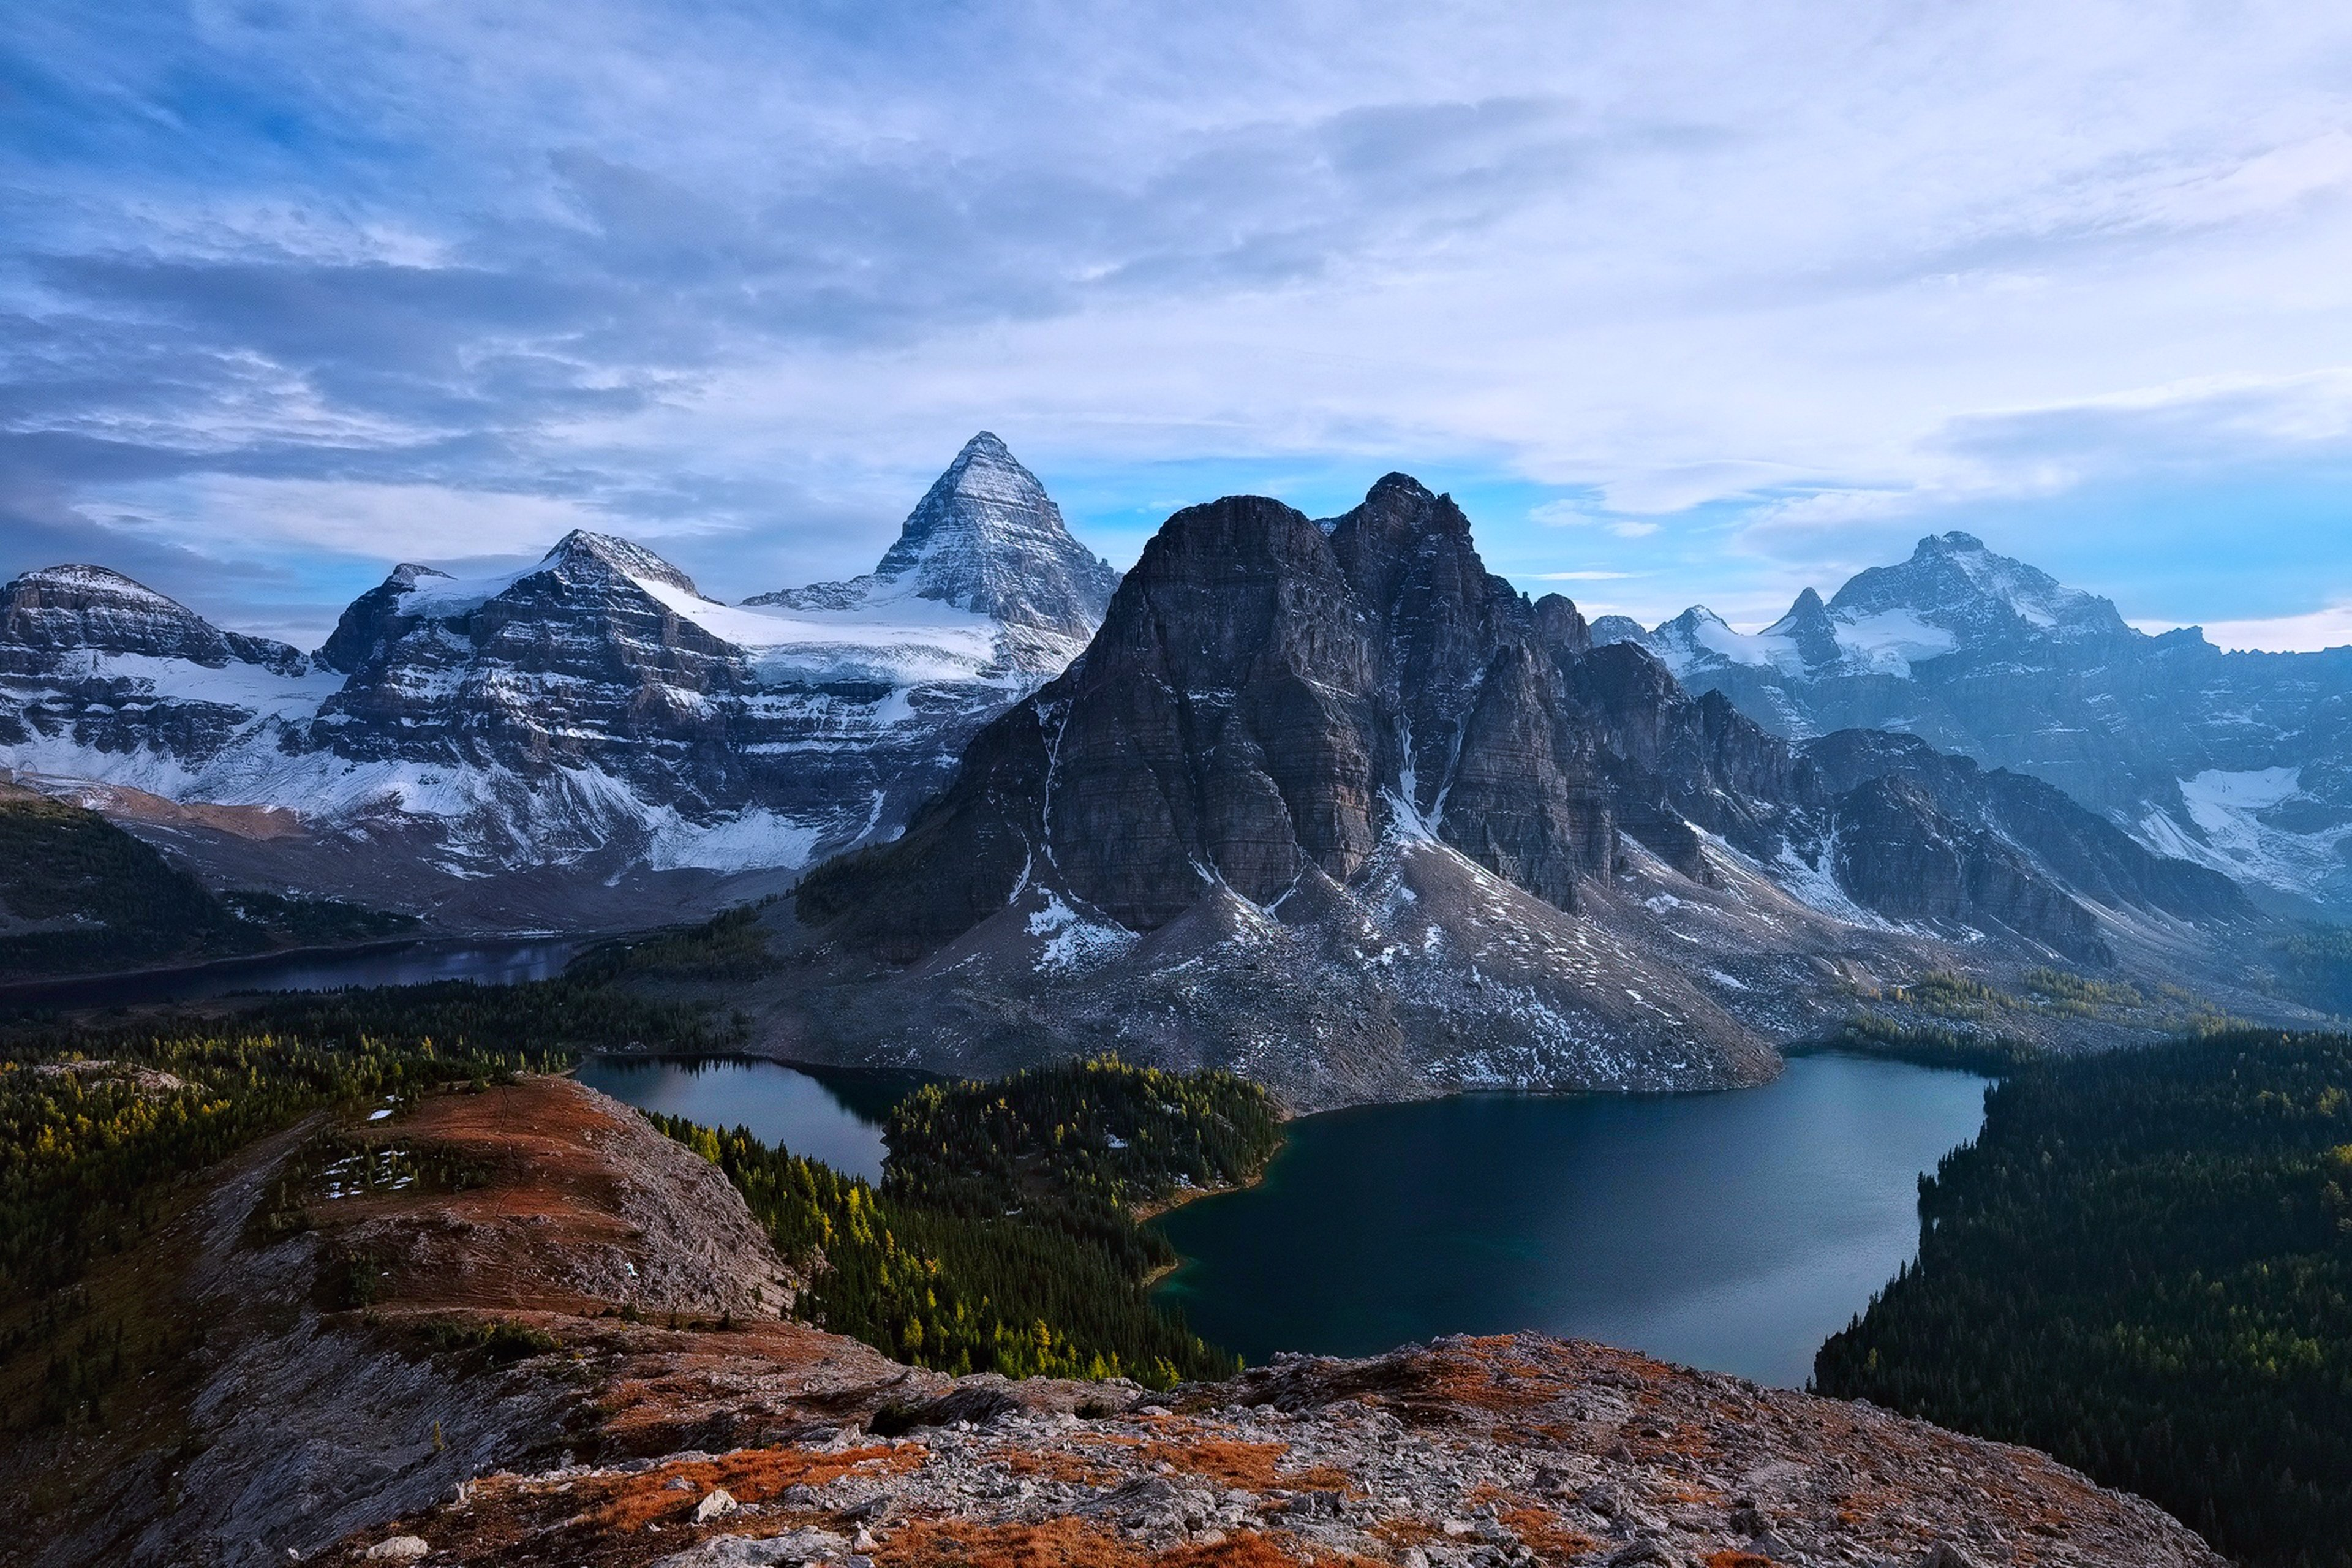 Canada British Columbia Alberta Mt Assiniboine Mountains